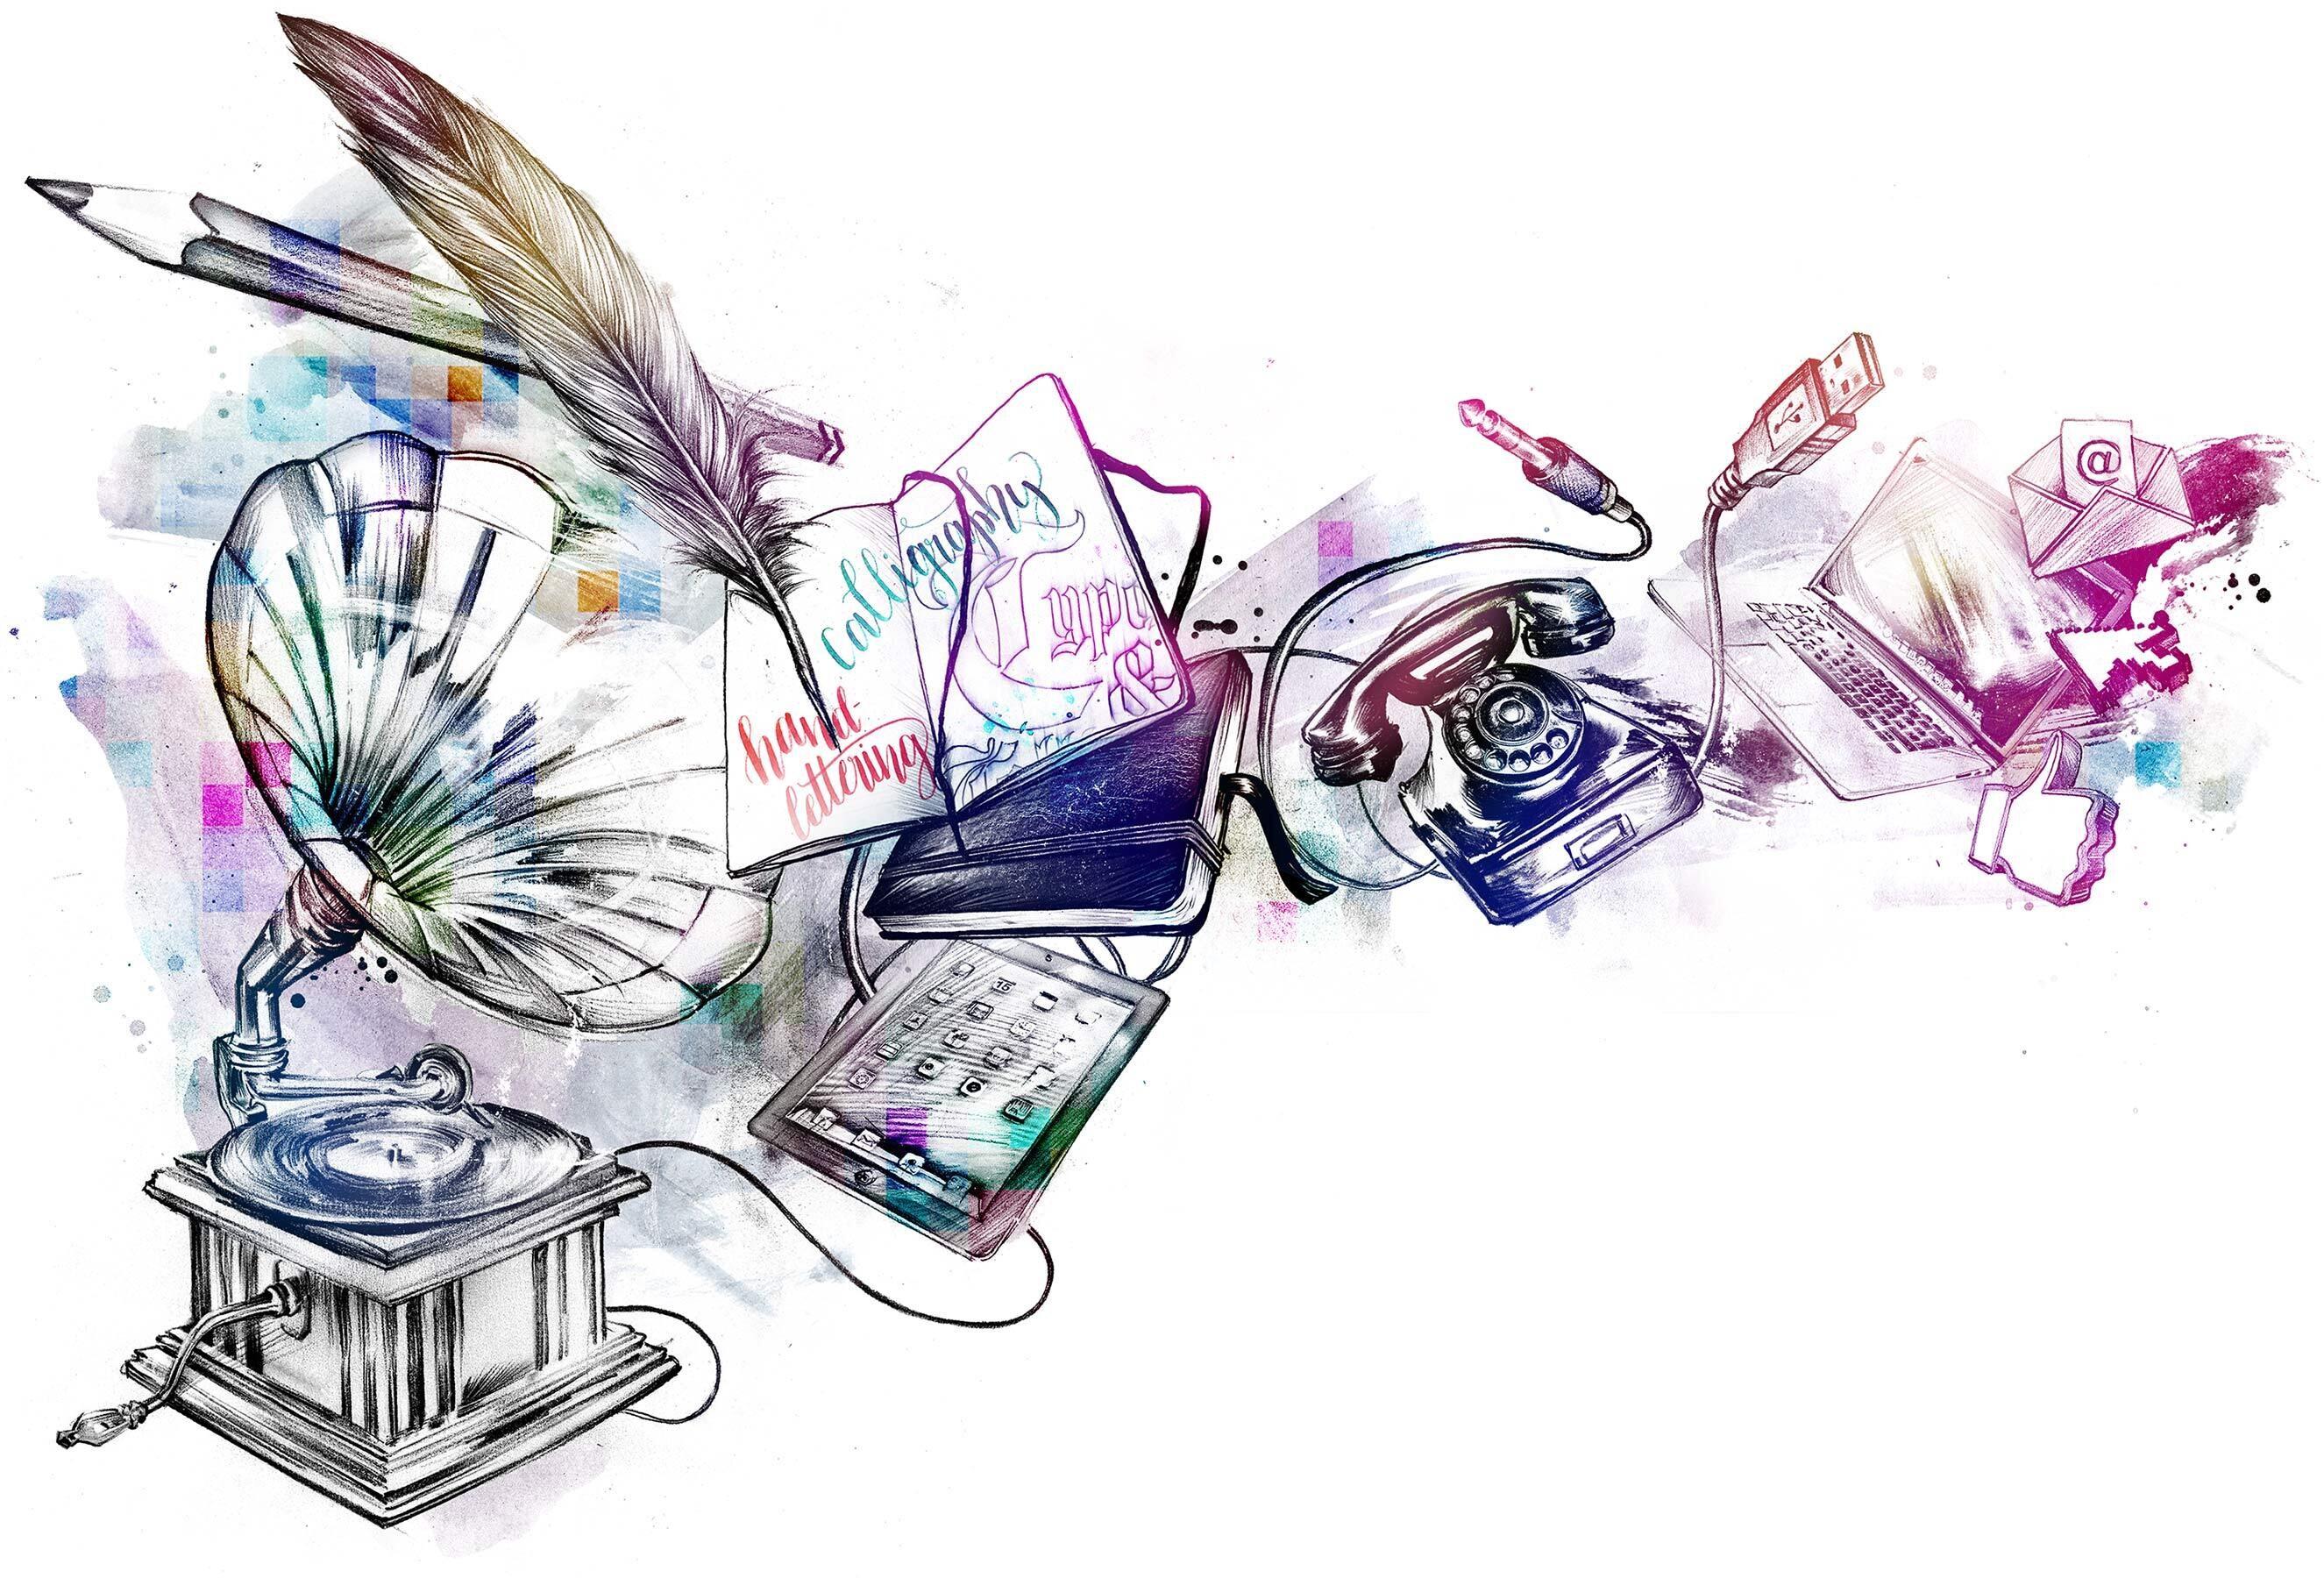 Analog digital editorial illustration - Kornel Illustration   Kornel Stadler portfolio